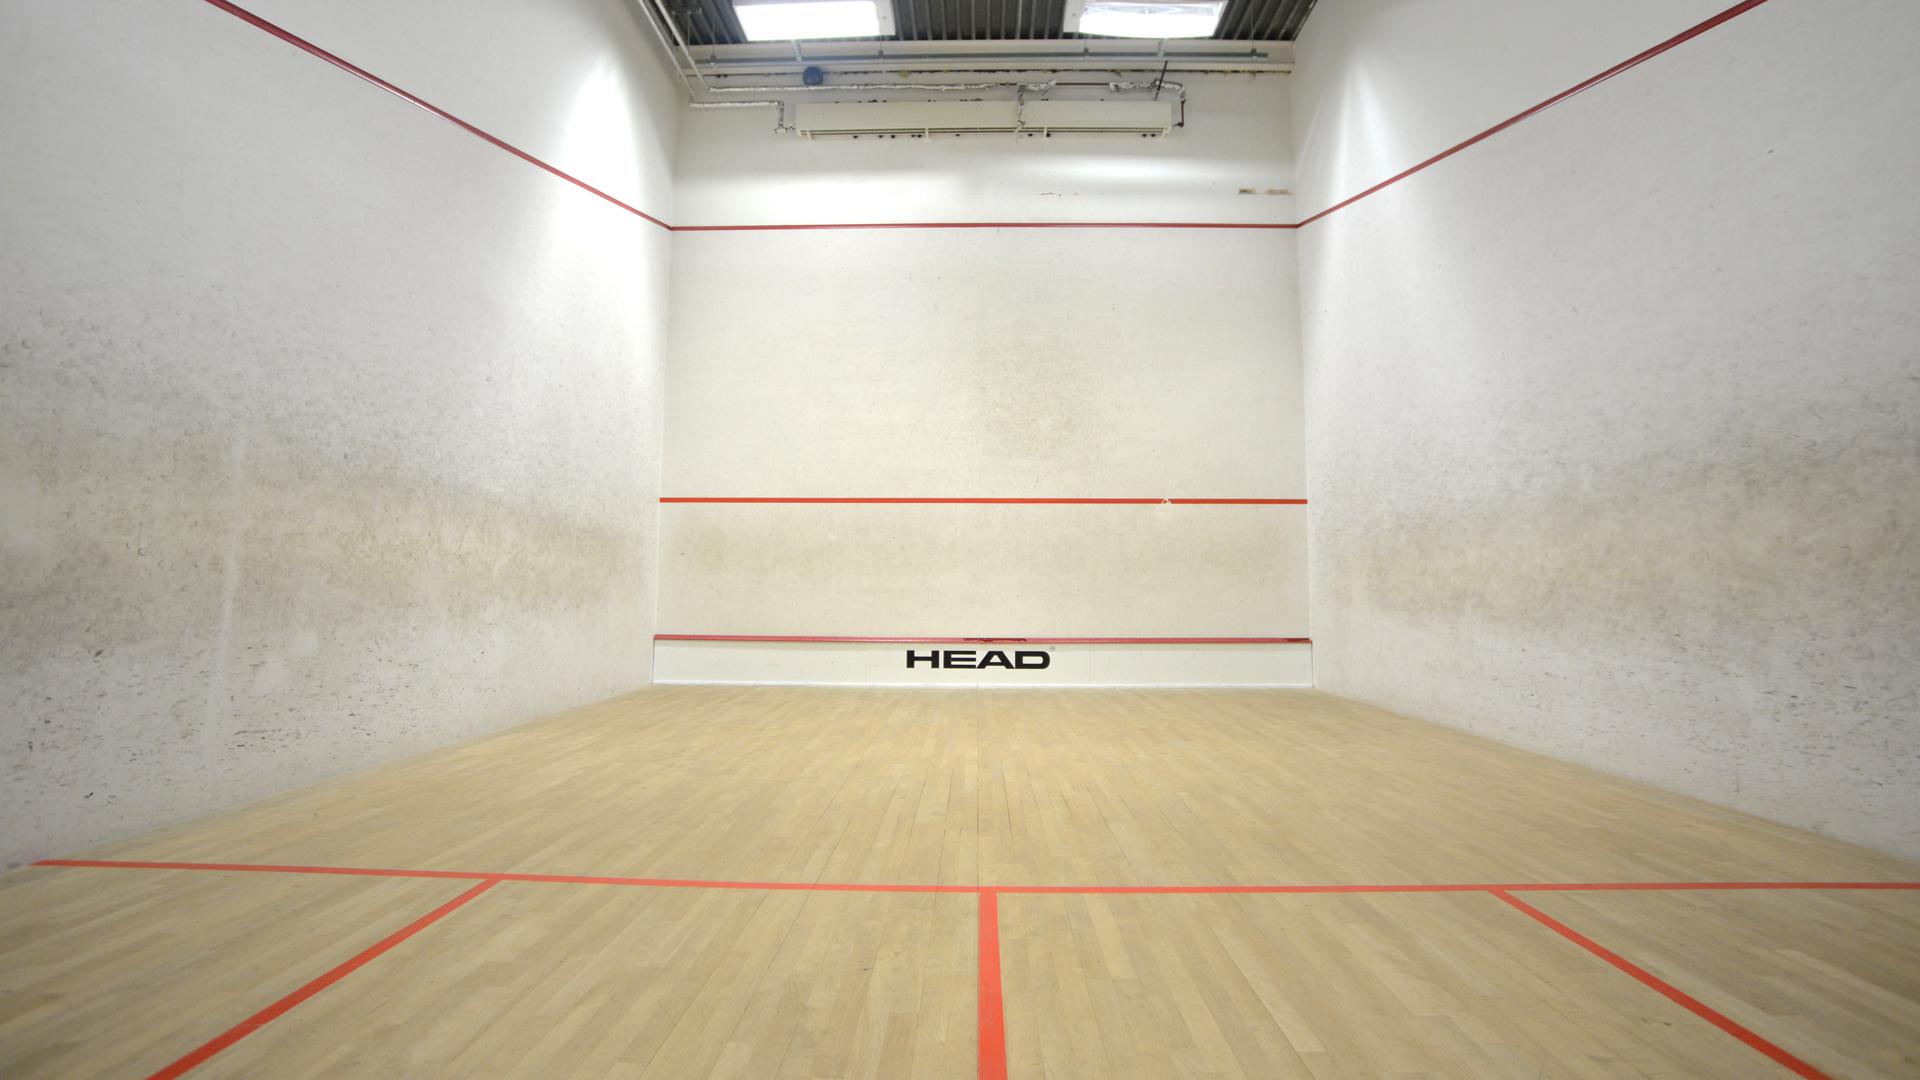 squash racket wallpapers desktop